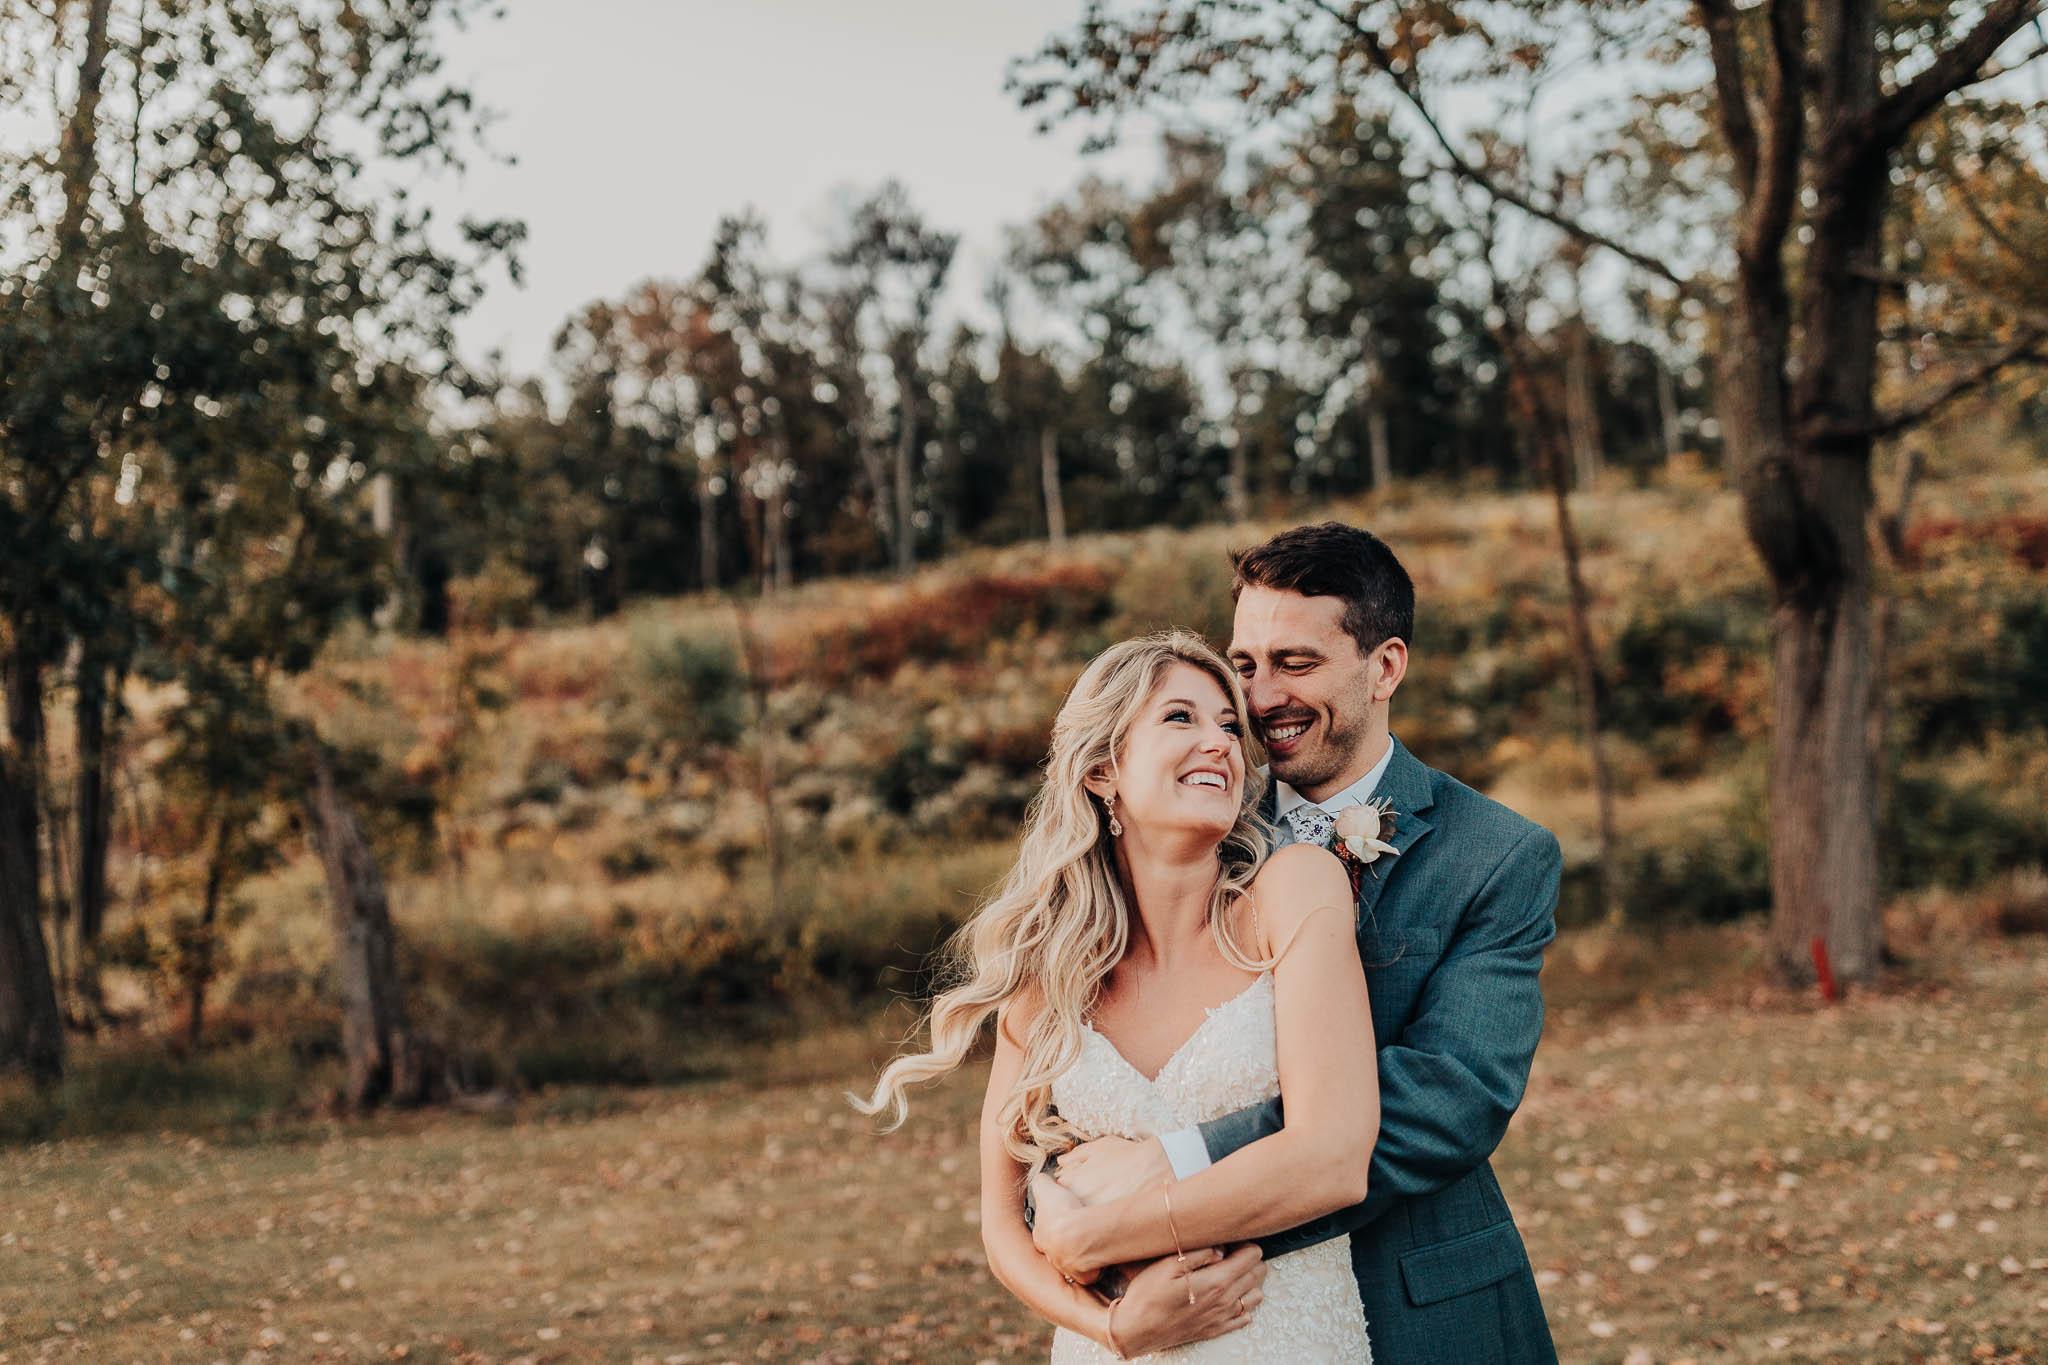 Frosty-Valley-September-Wedding-8234.jpg